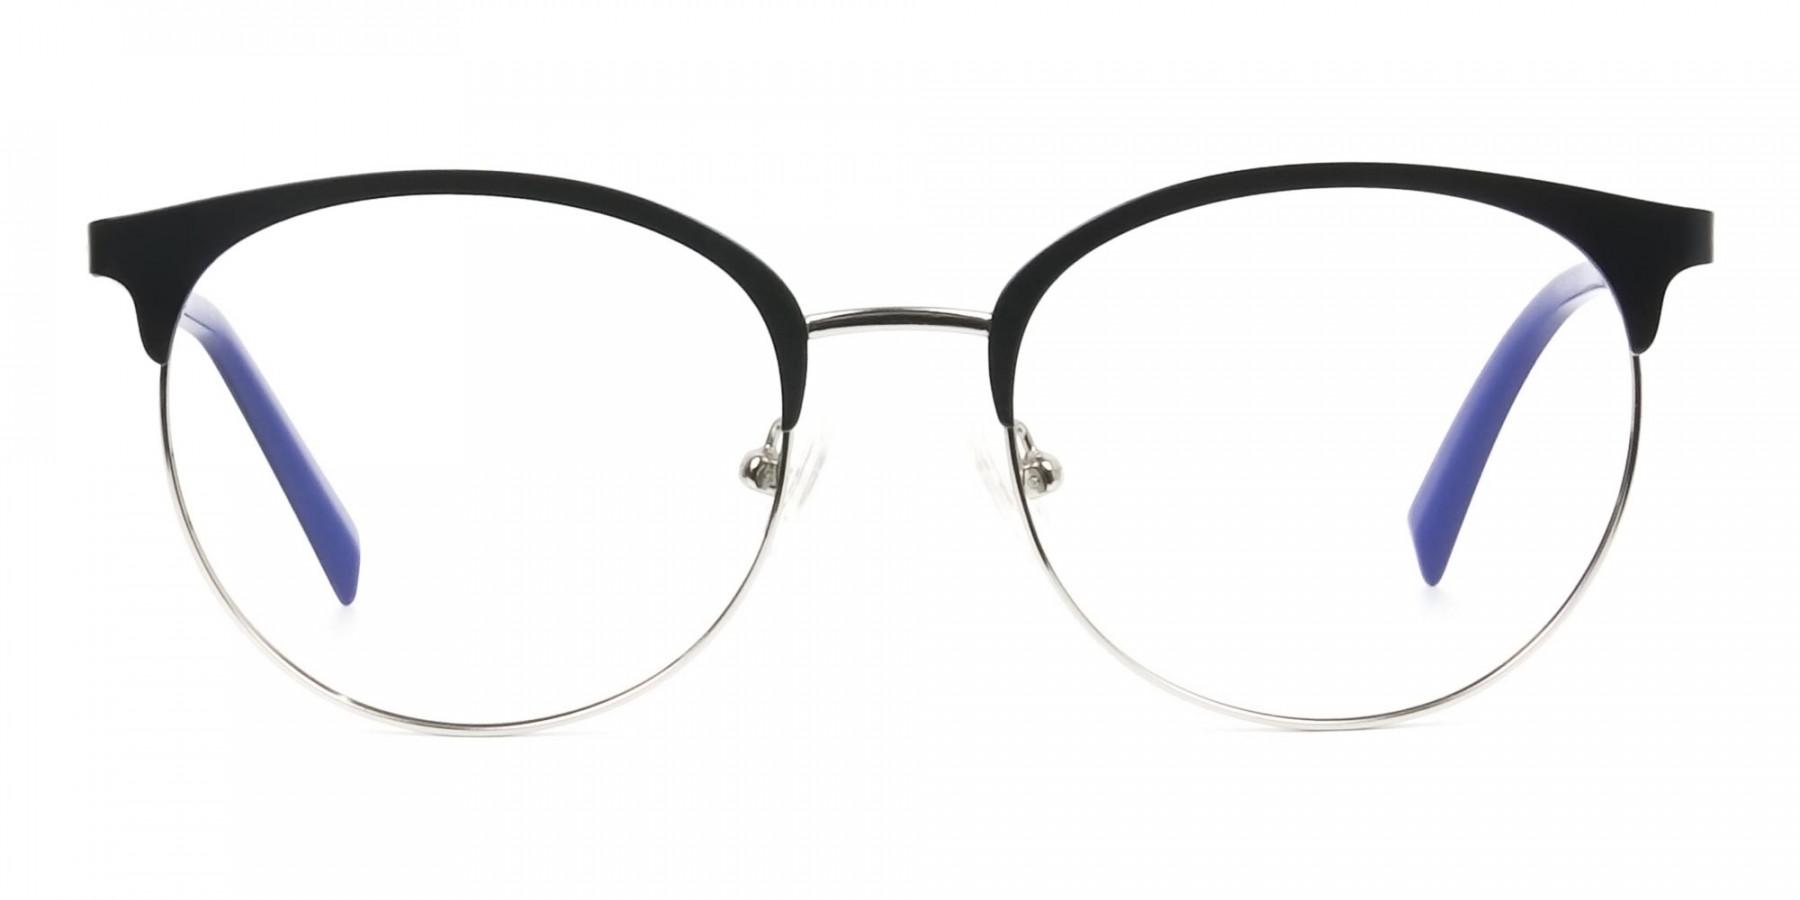 Round Navy Blue Silver Clubmaster Glasses Men Women - 1